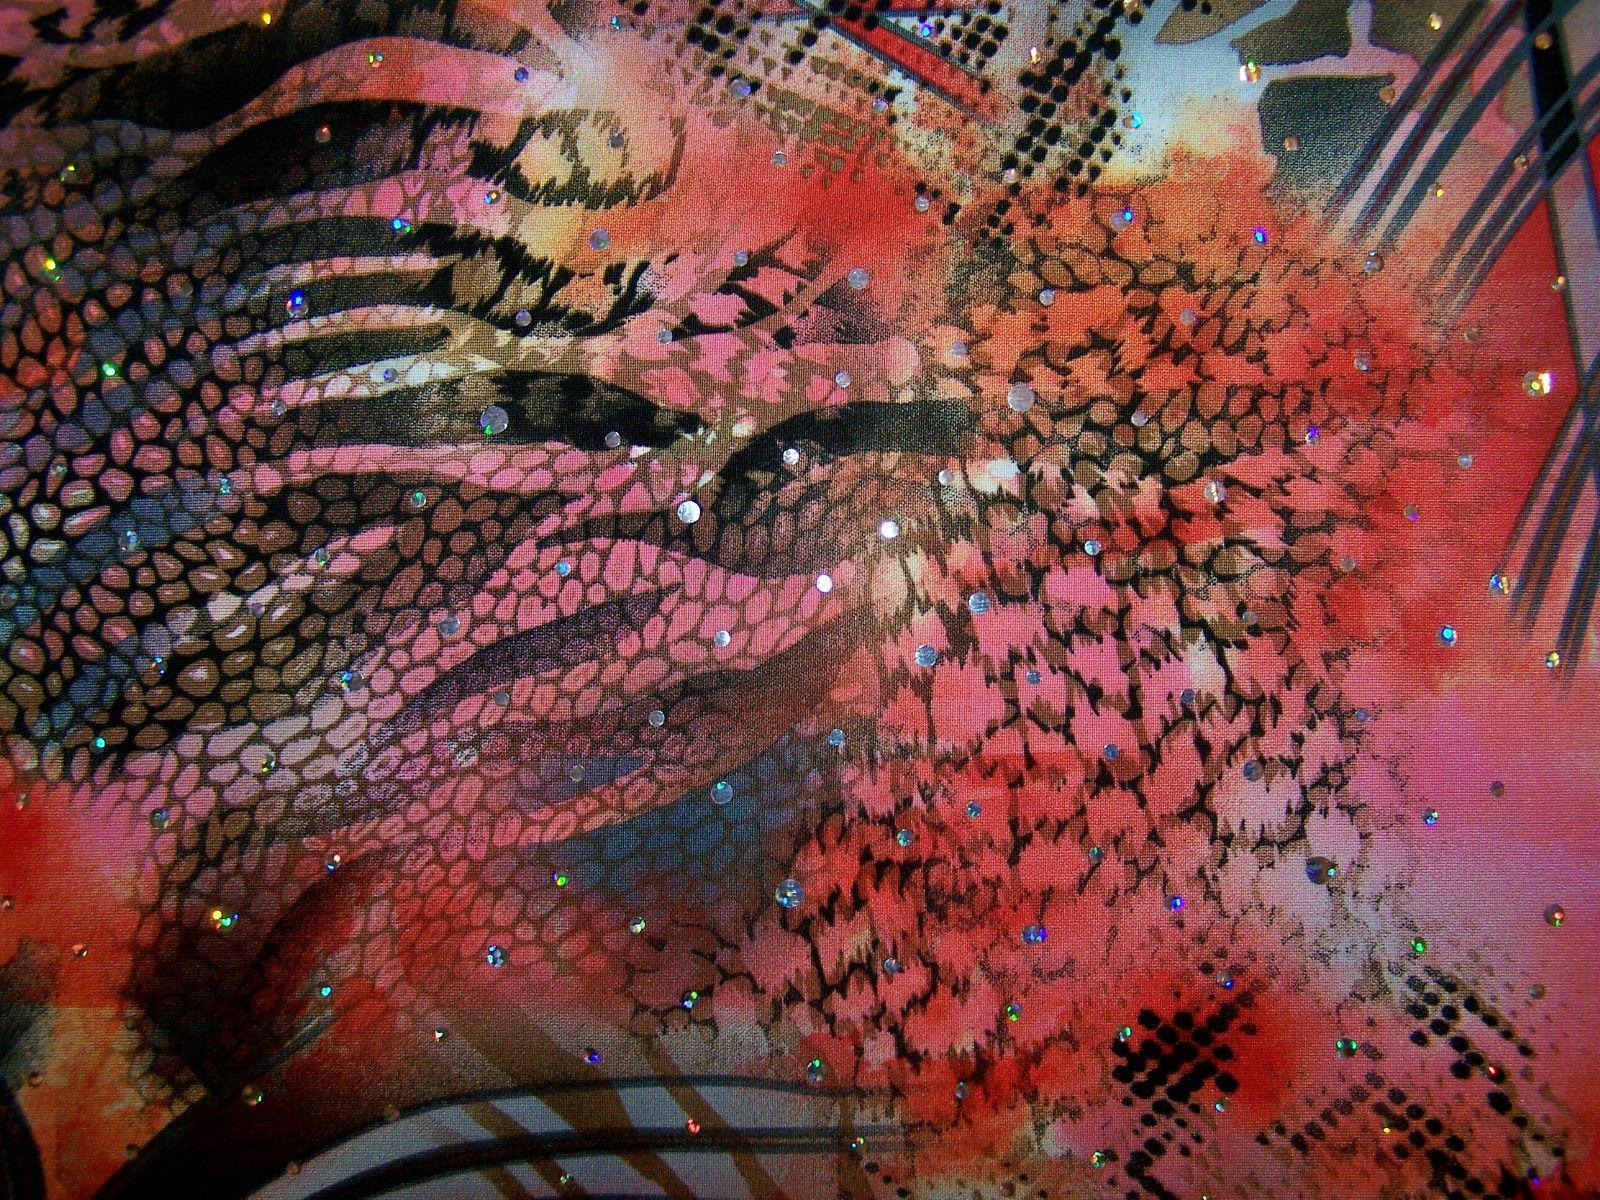 Red Swirly Animal Print Hologram Sequin Dot Lycra Stretch Fabric 1 Yard 18 Inch